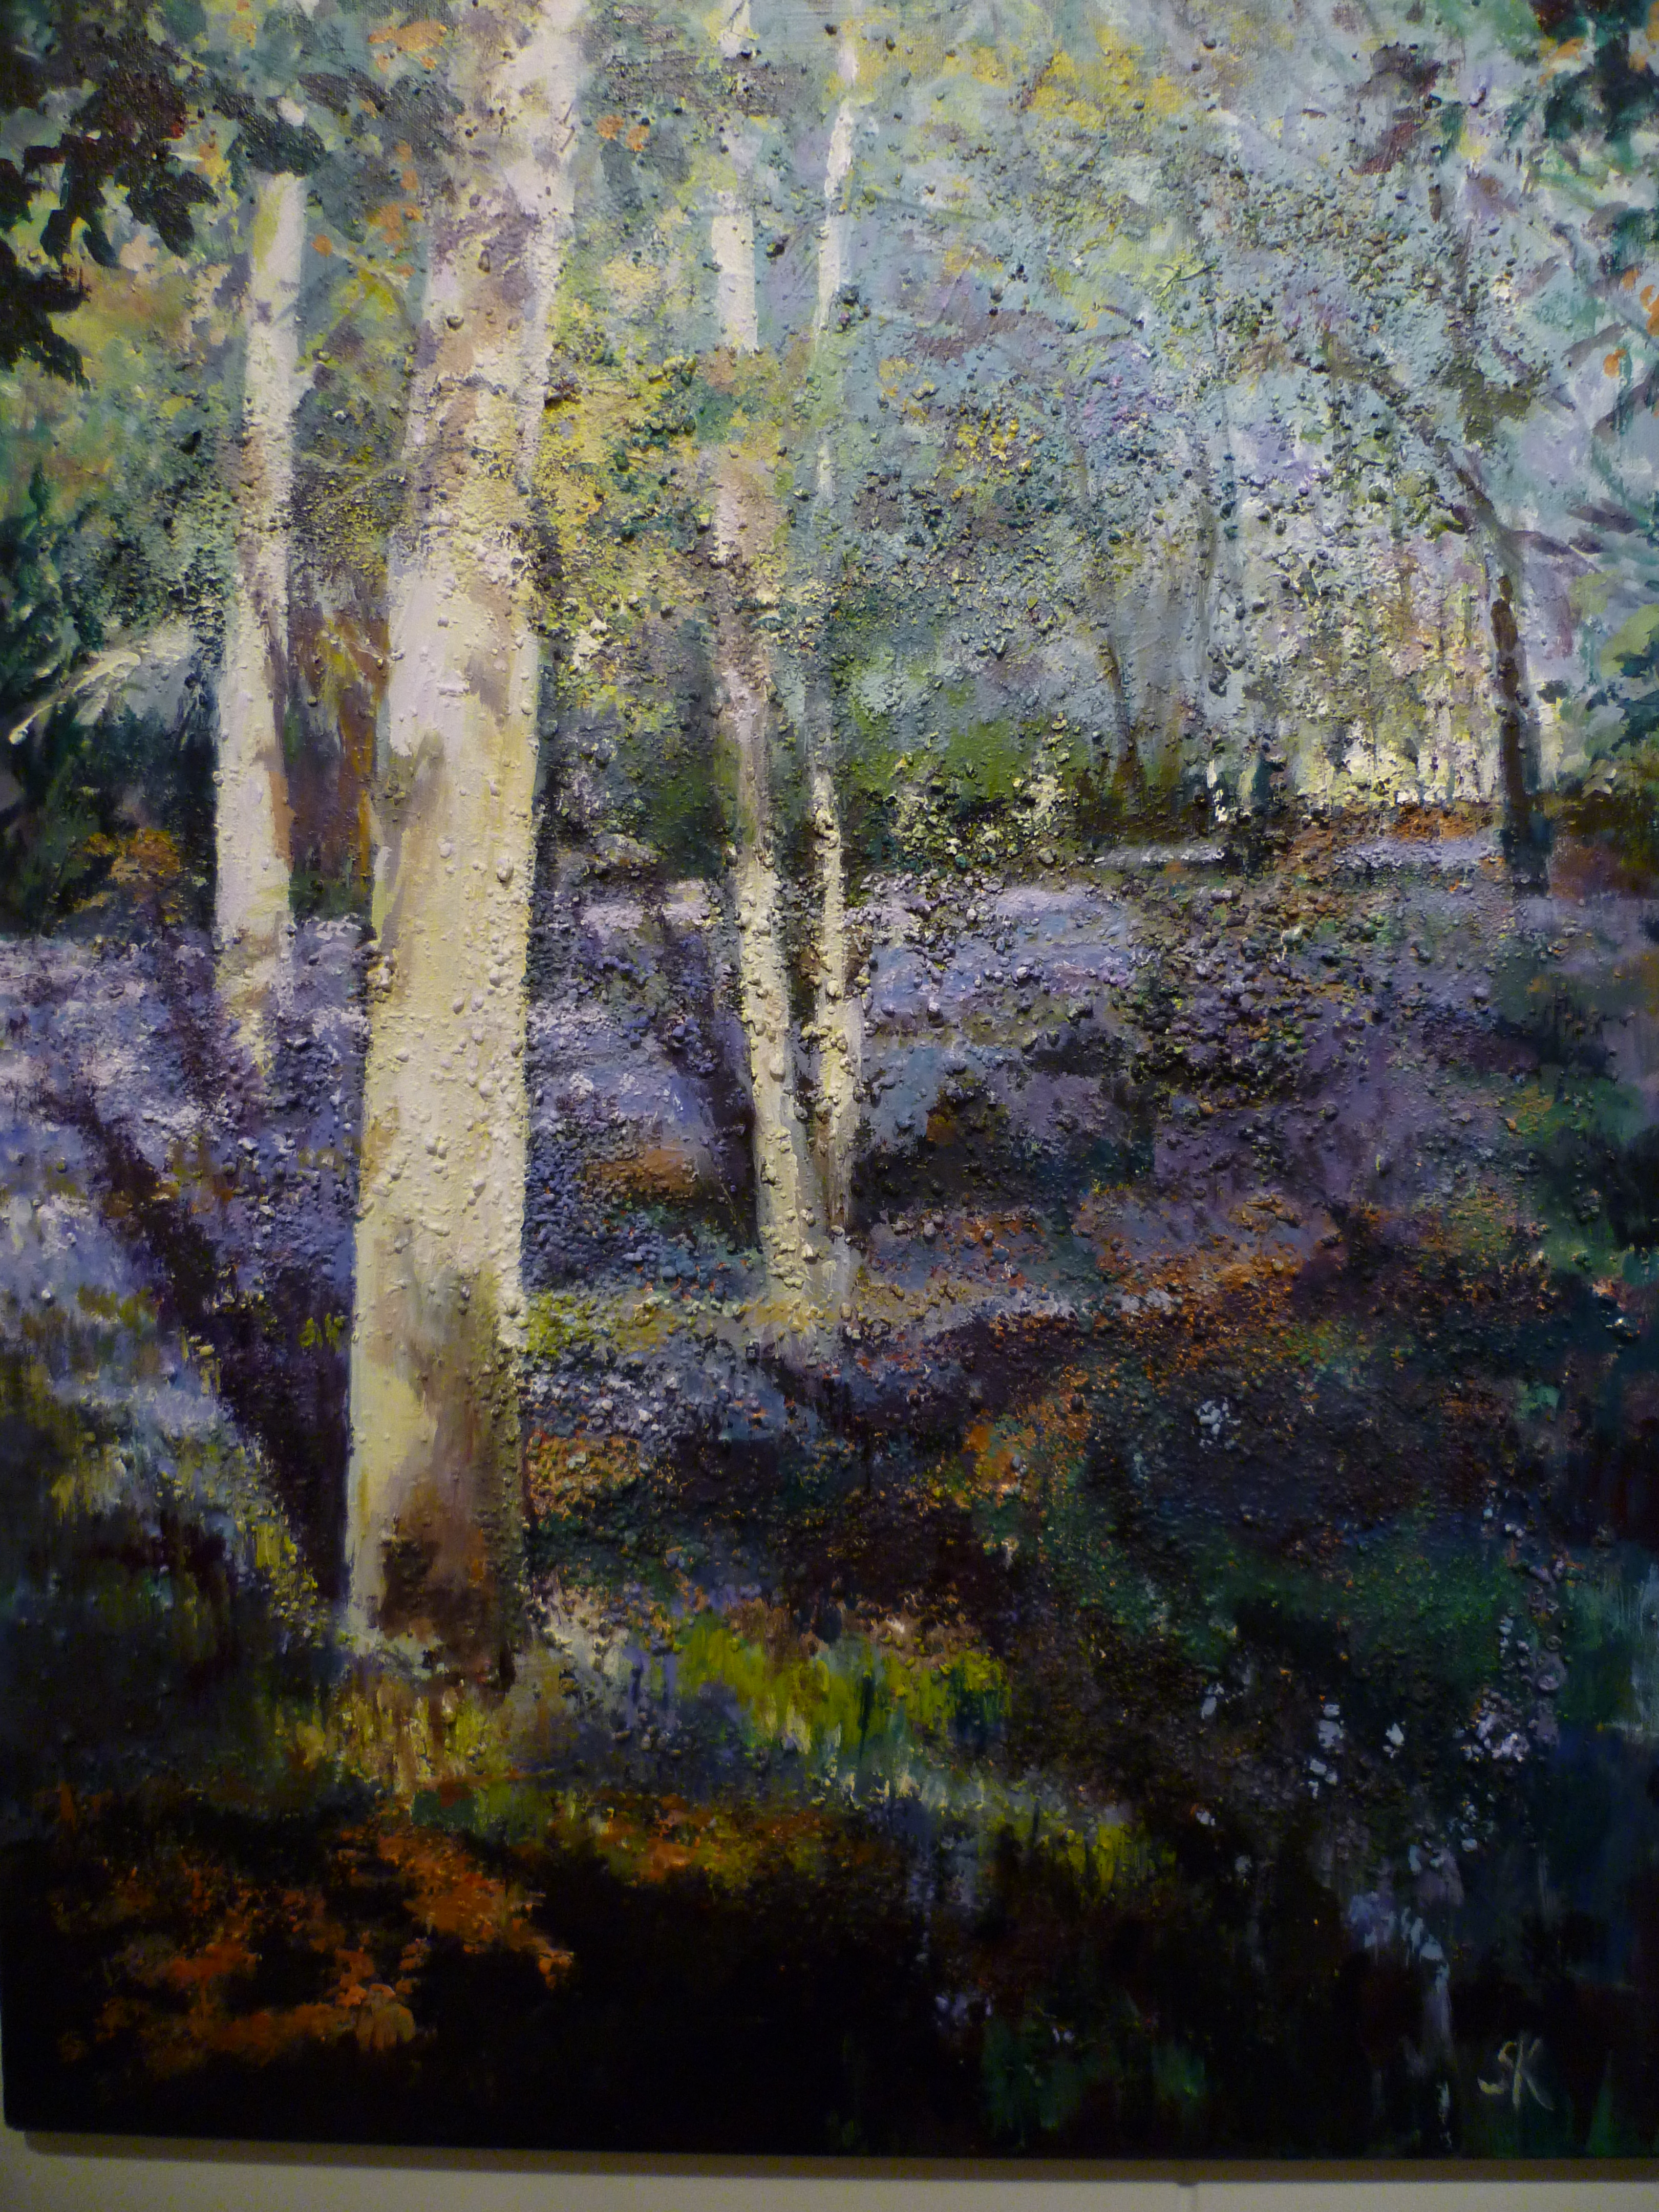 Sheila Karren's Bluebell Wood